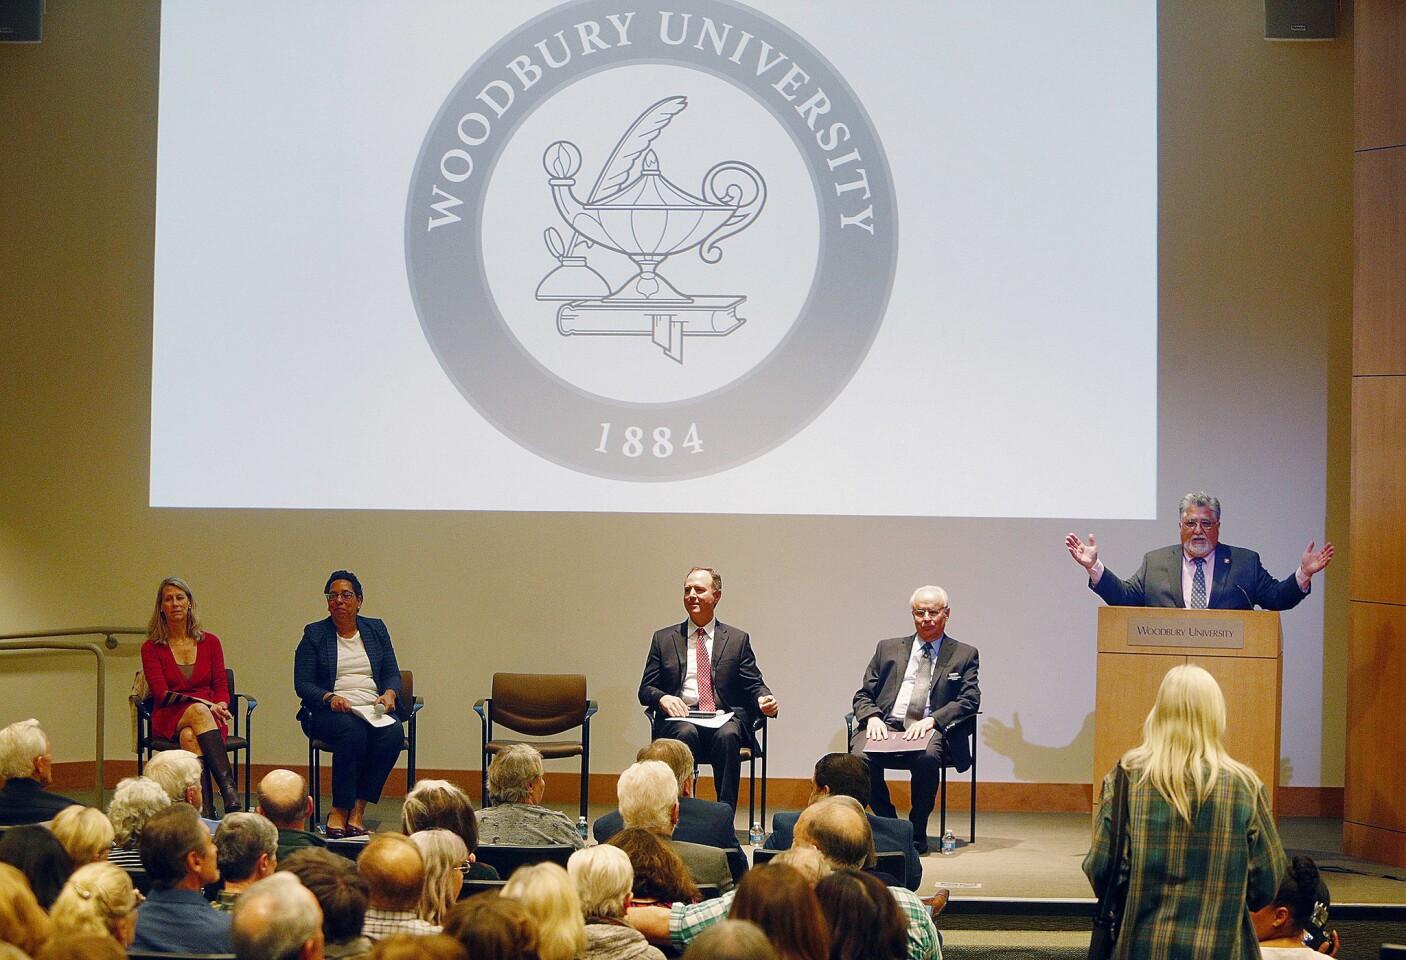 Photo Gallery: U.S. Senator Adam Schiff and California State Senator Anthony Portantino on gun violence panel at Woodbury University